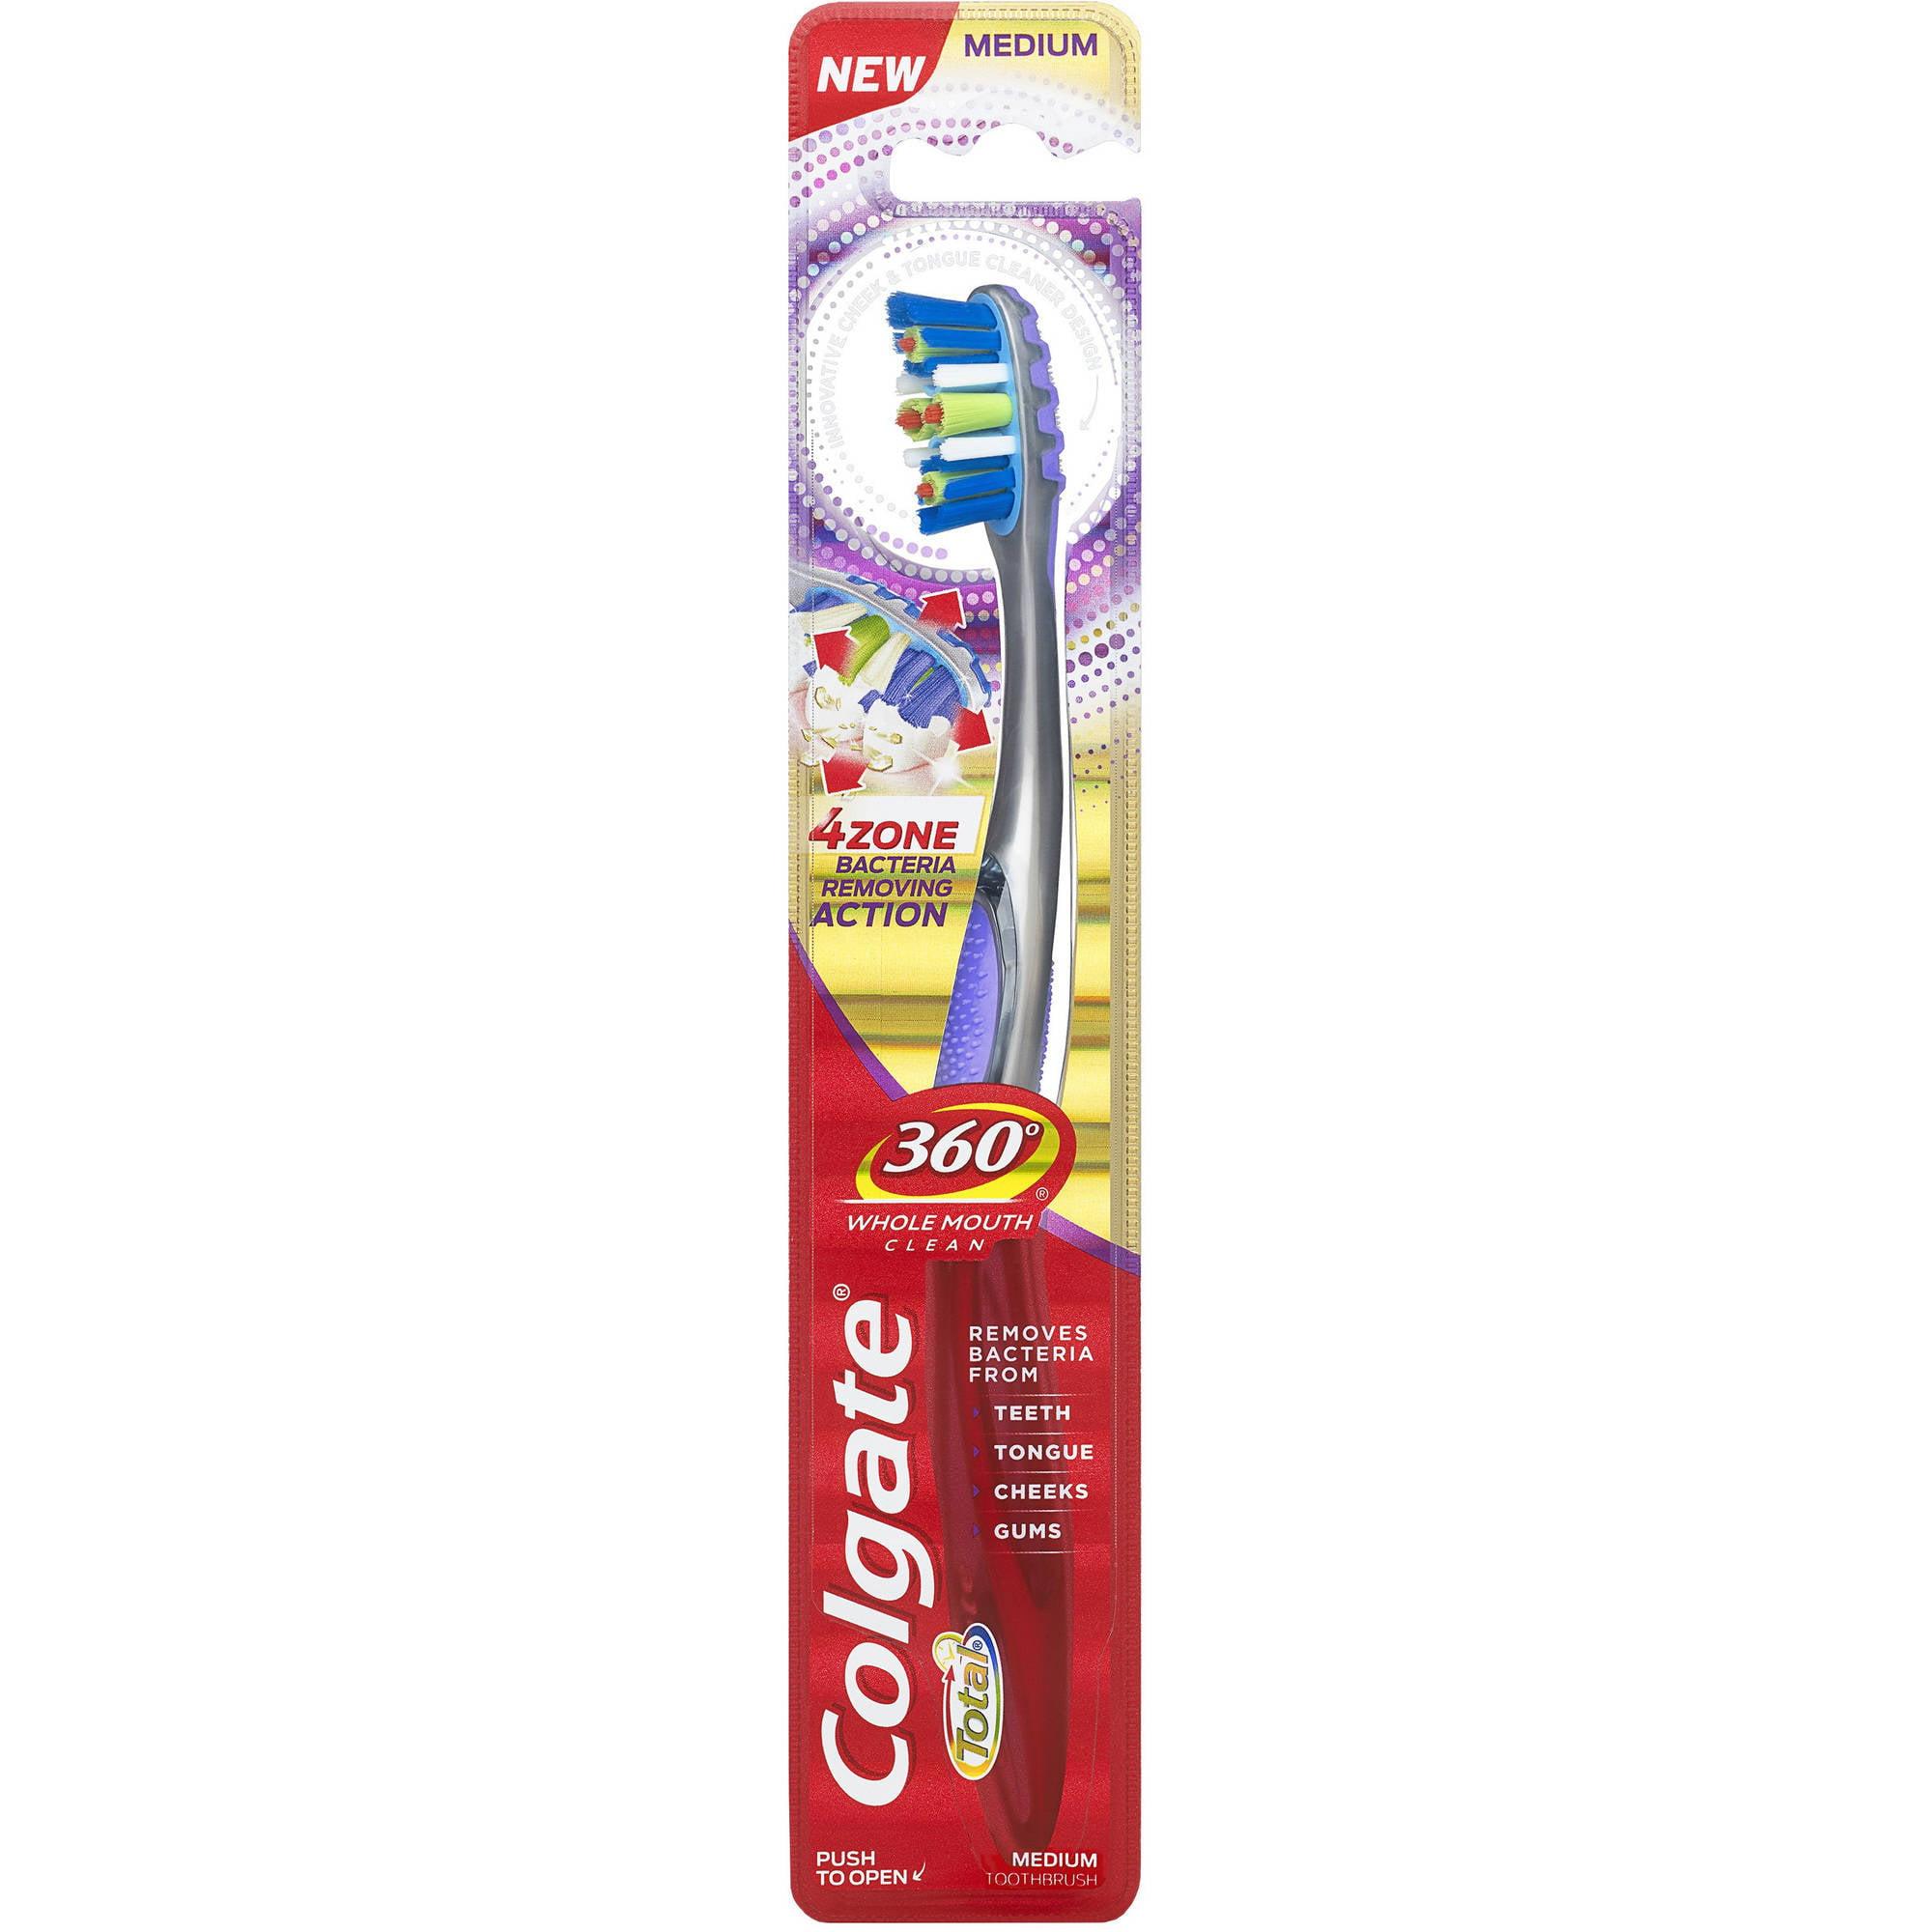 Colgate 360 Advanced 4 Zone Toothbrush, Medium